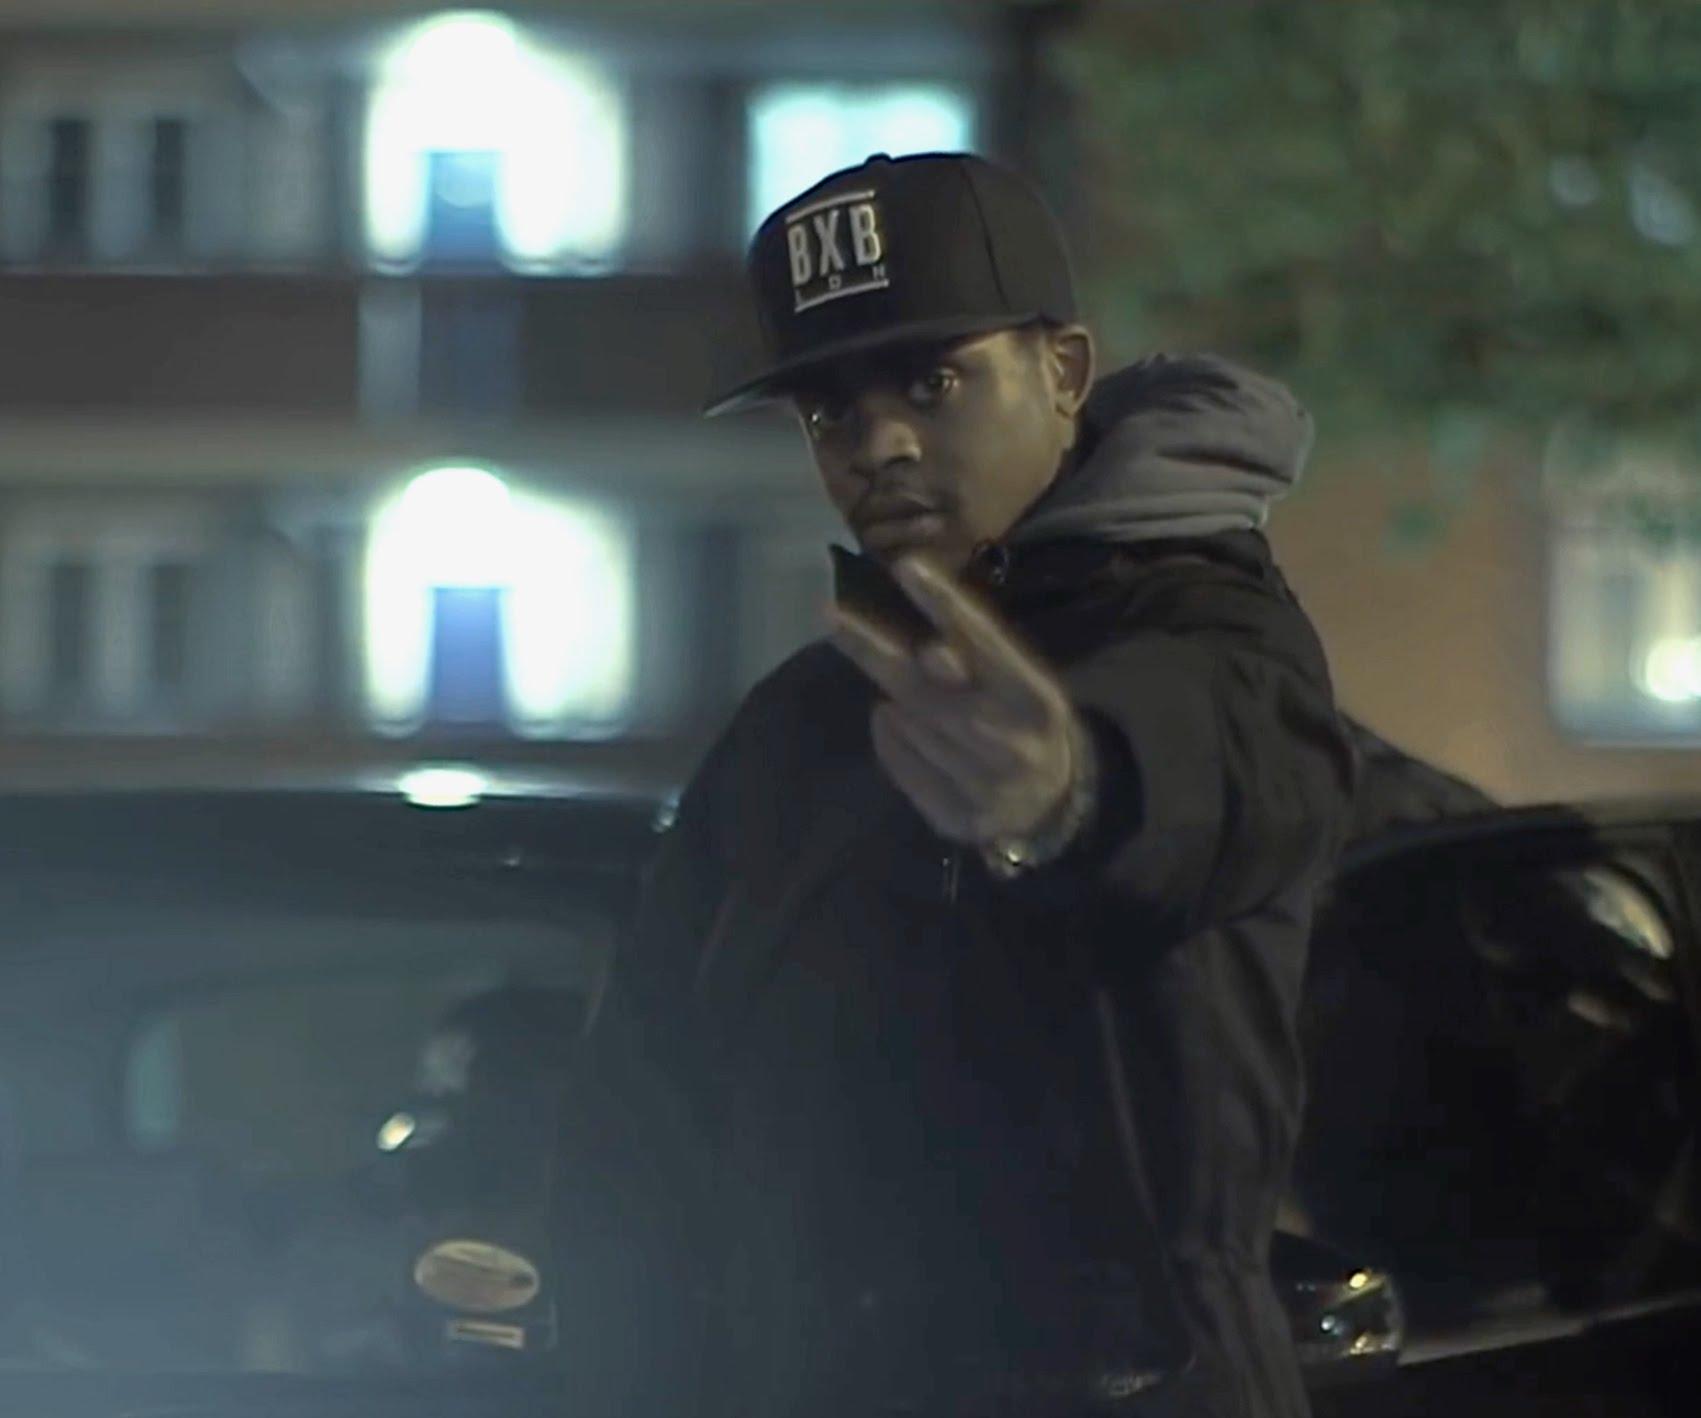 67 (Scribz, Liquez, Asap & Dimzy) – Shutdown [Music Video] @official6ix7 @Scribz6ix7even @liquez67 @ASAP6IX @TheRealDimzy